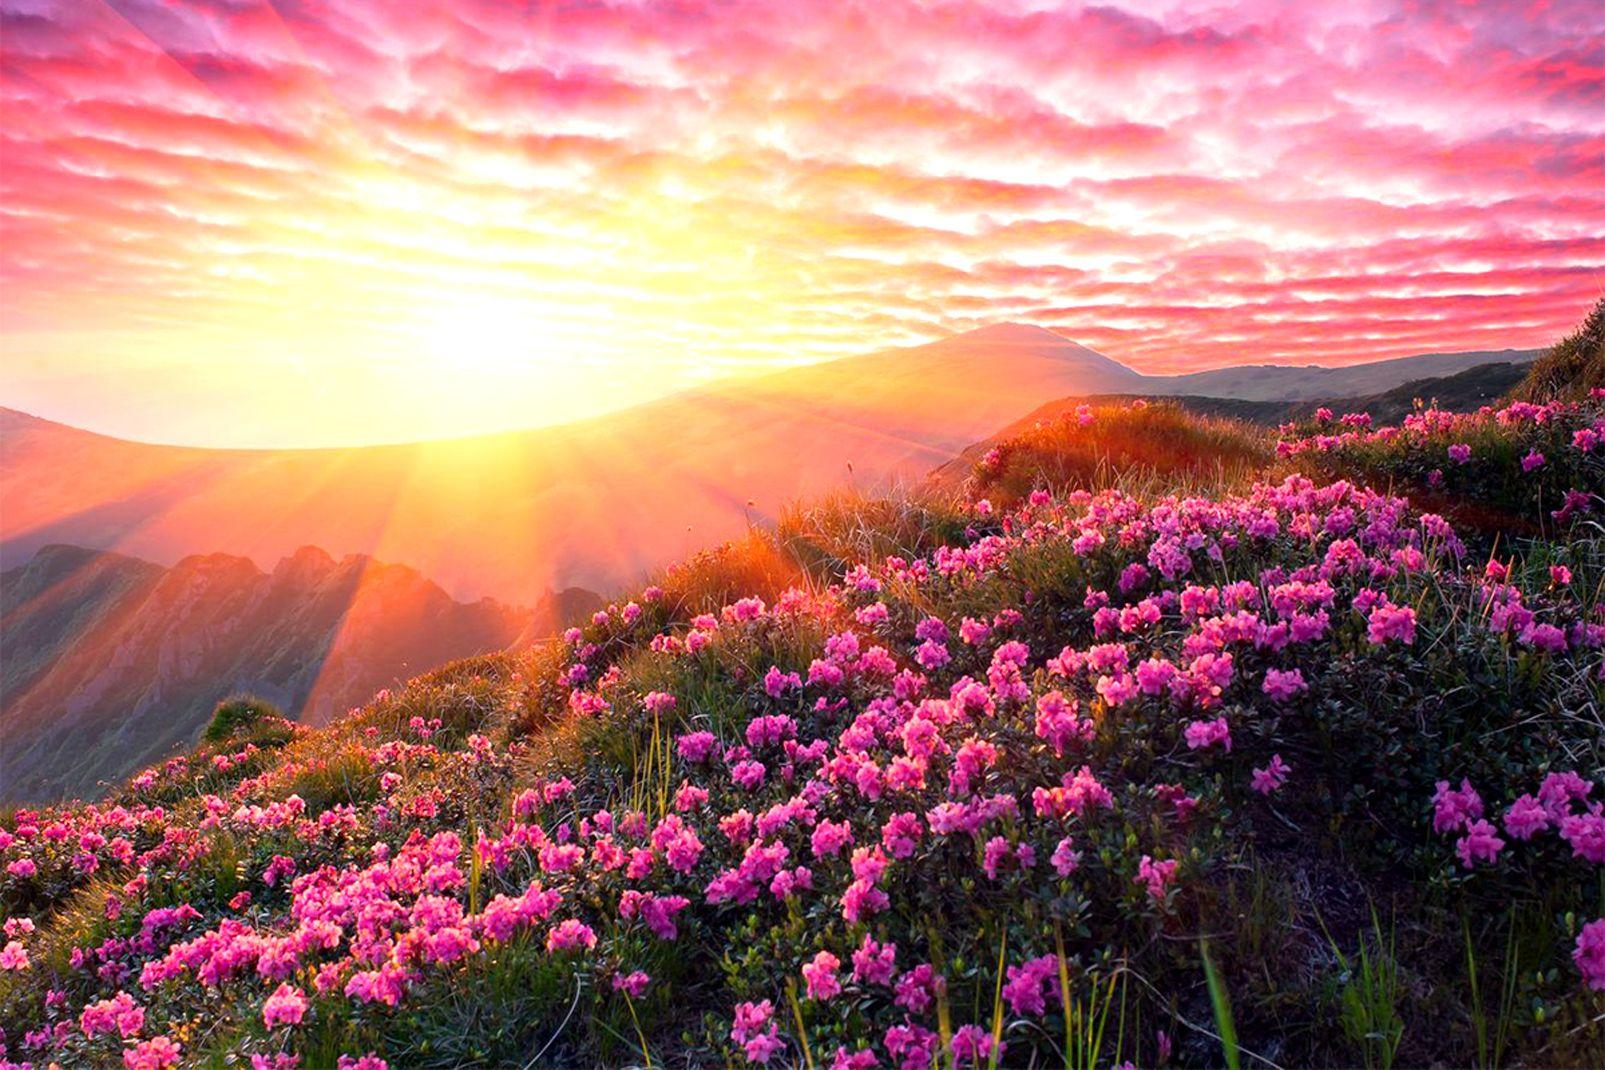 amerique, canada, ouest, nord, rhododendron, montagne, territoires du nord-ouest